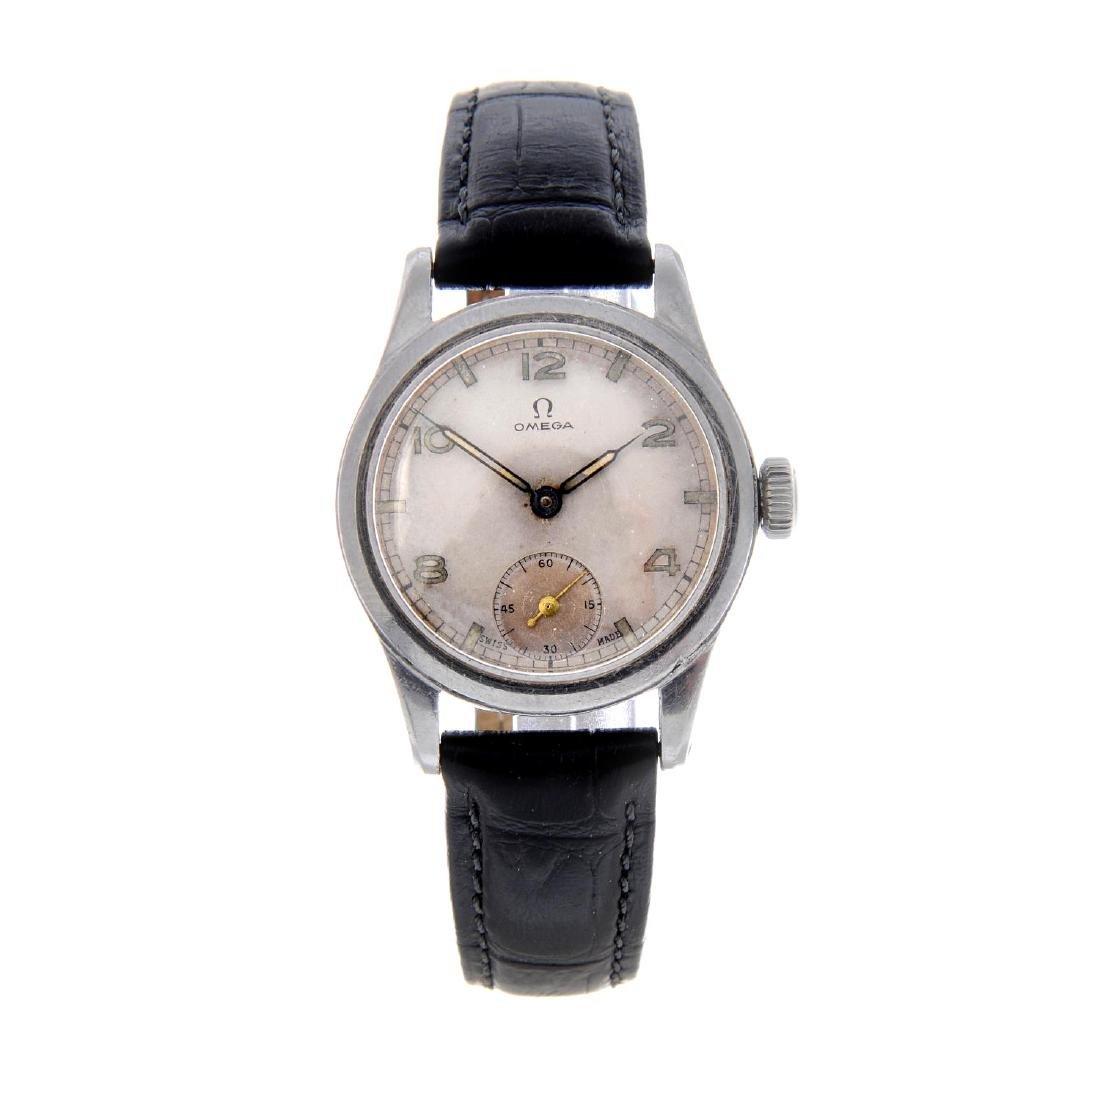 OMEGA - a gentleman's wrist watch. Stainless steel